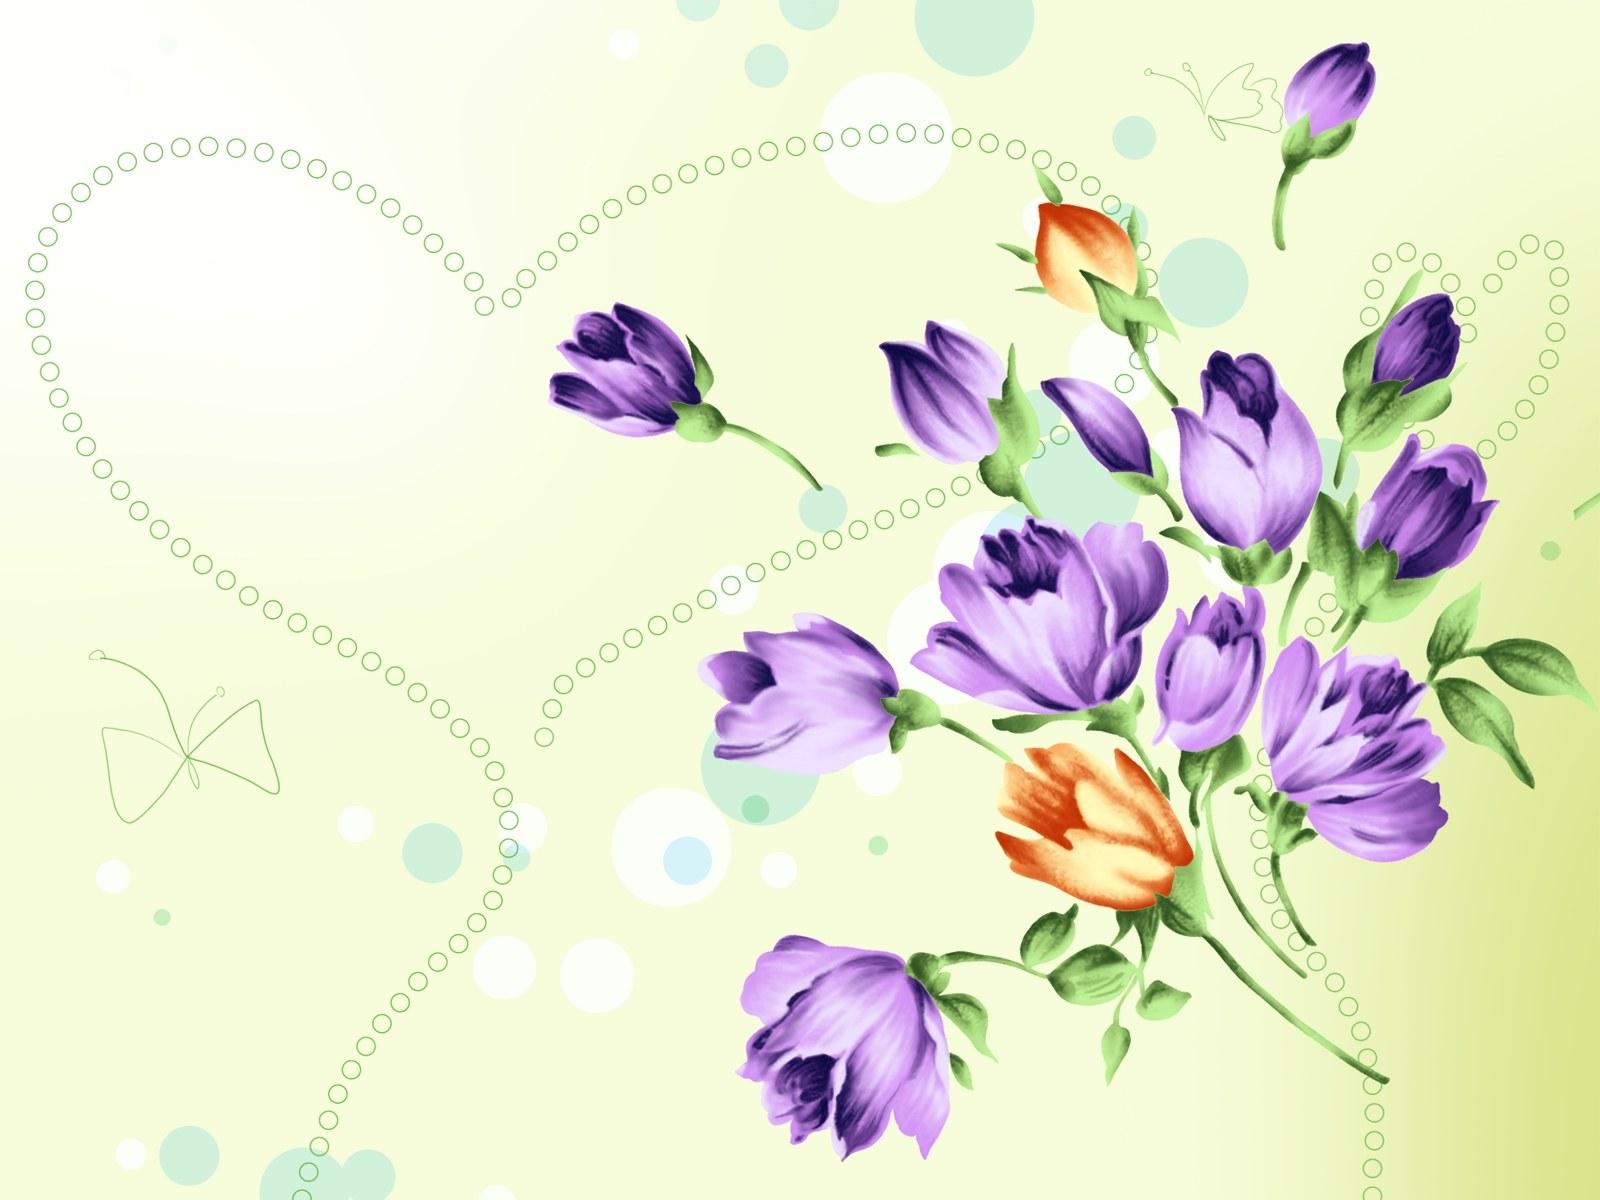 flower floral designs artistic painting paintings imazes illustration illustrations